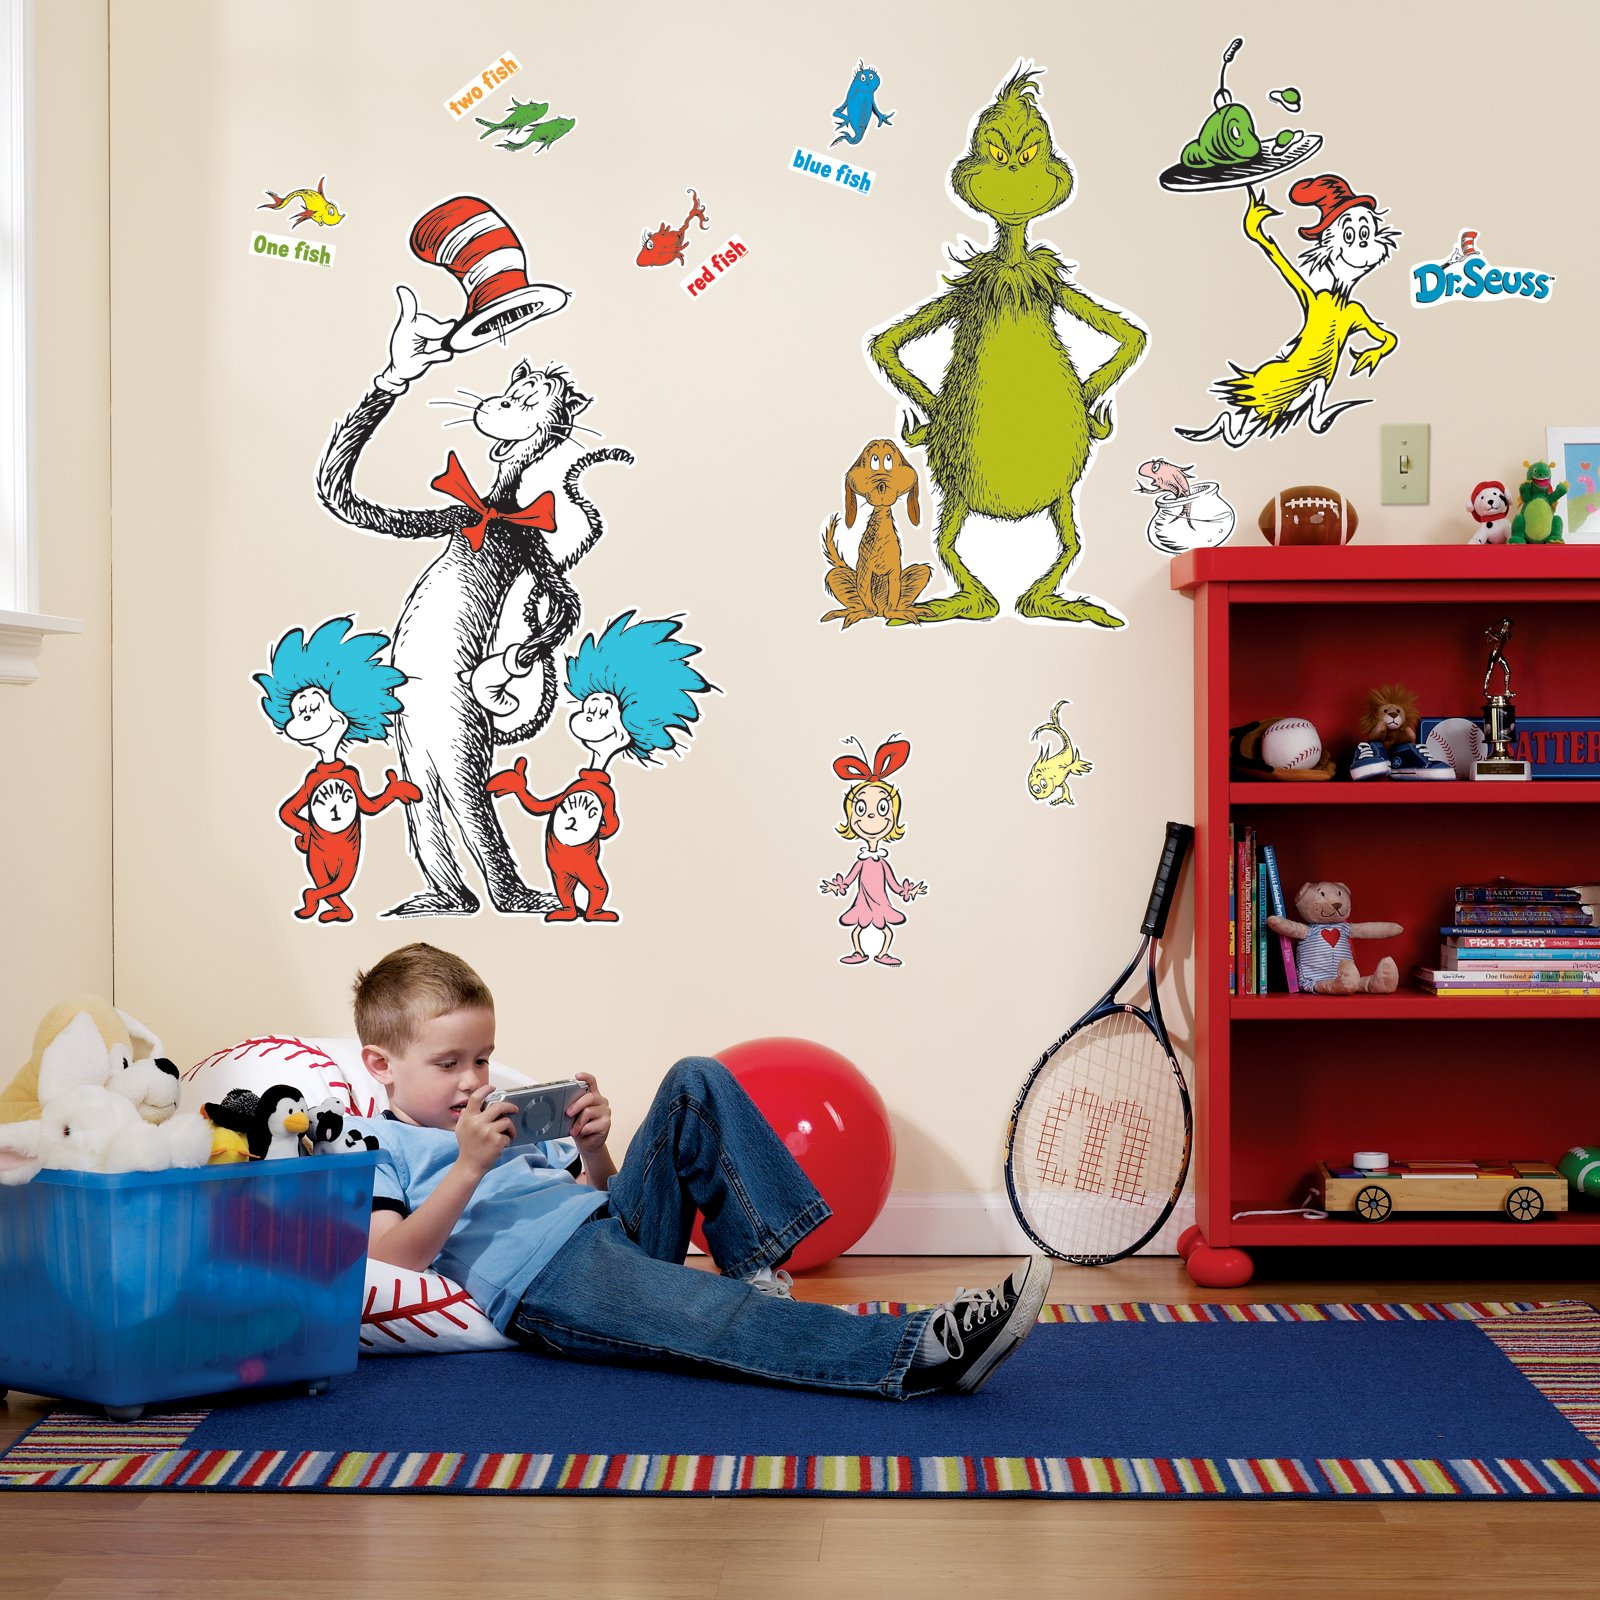 BirthdayExpress Dr Seuss Room Decor - Giant Wall Decals by BirthdayExpress (Image #1)